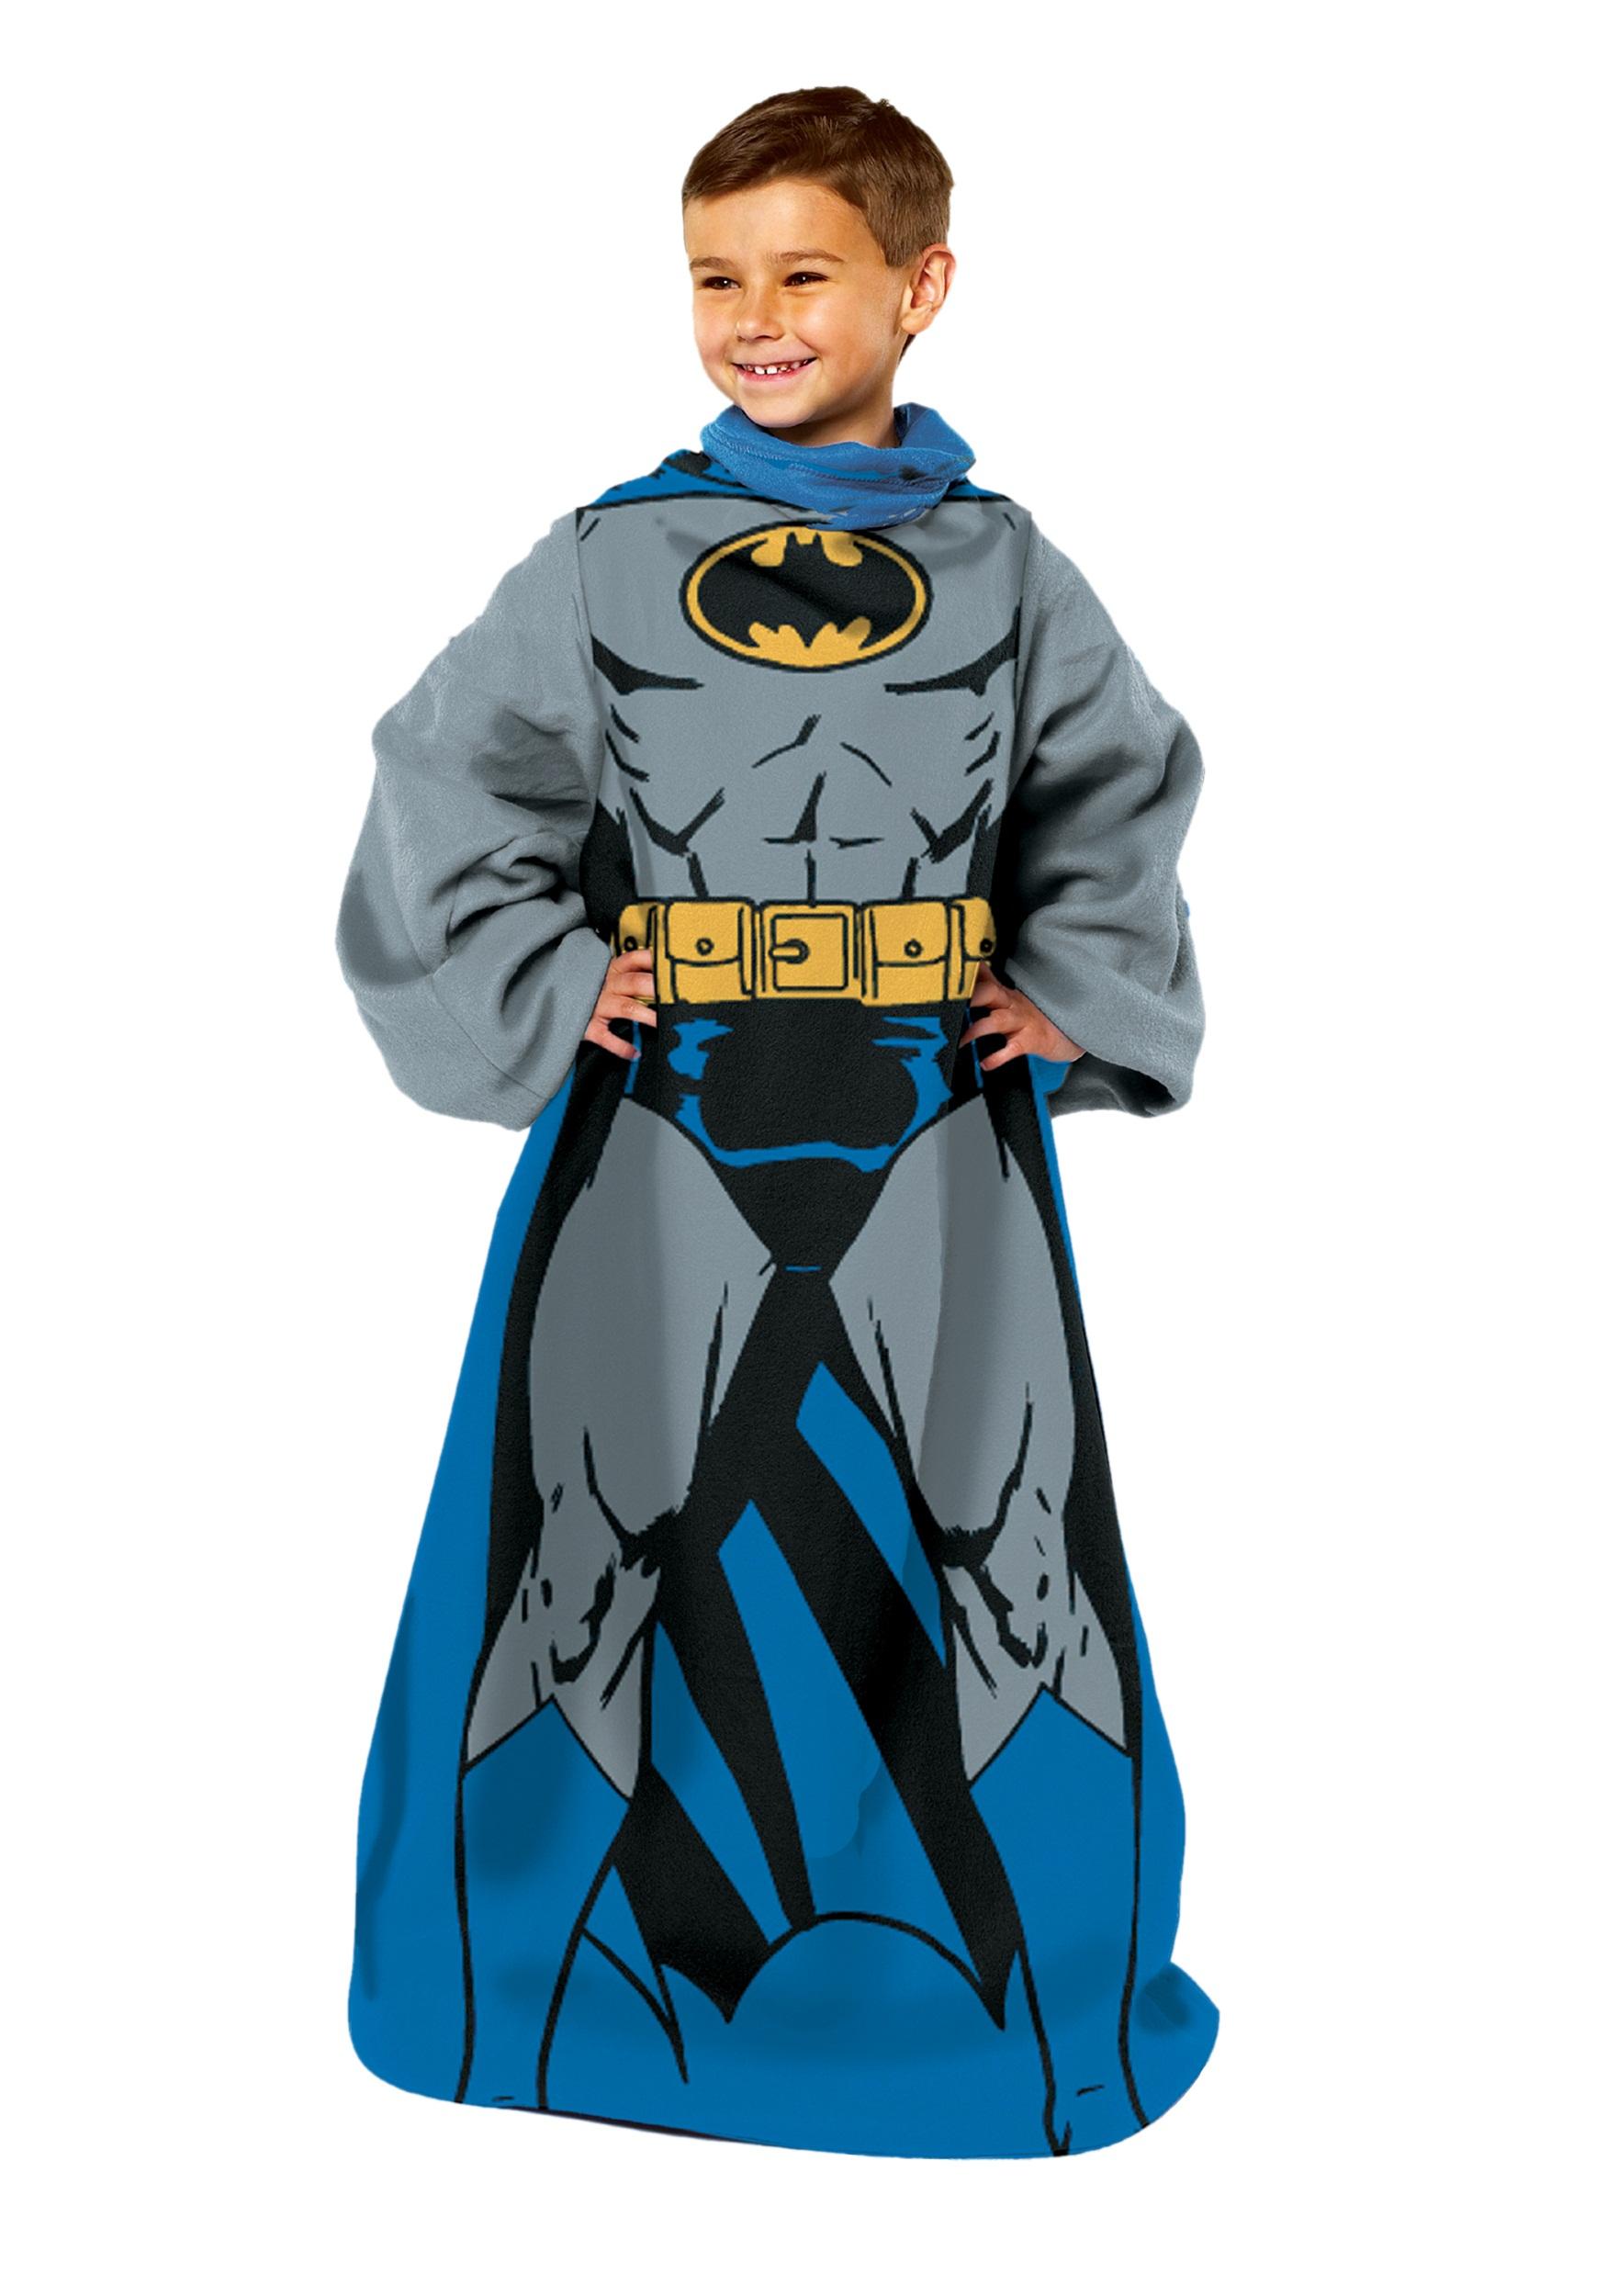 Being Batman Child Comfy Throw Costume